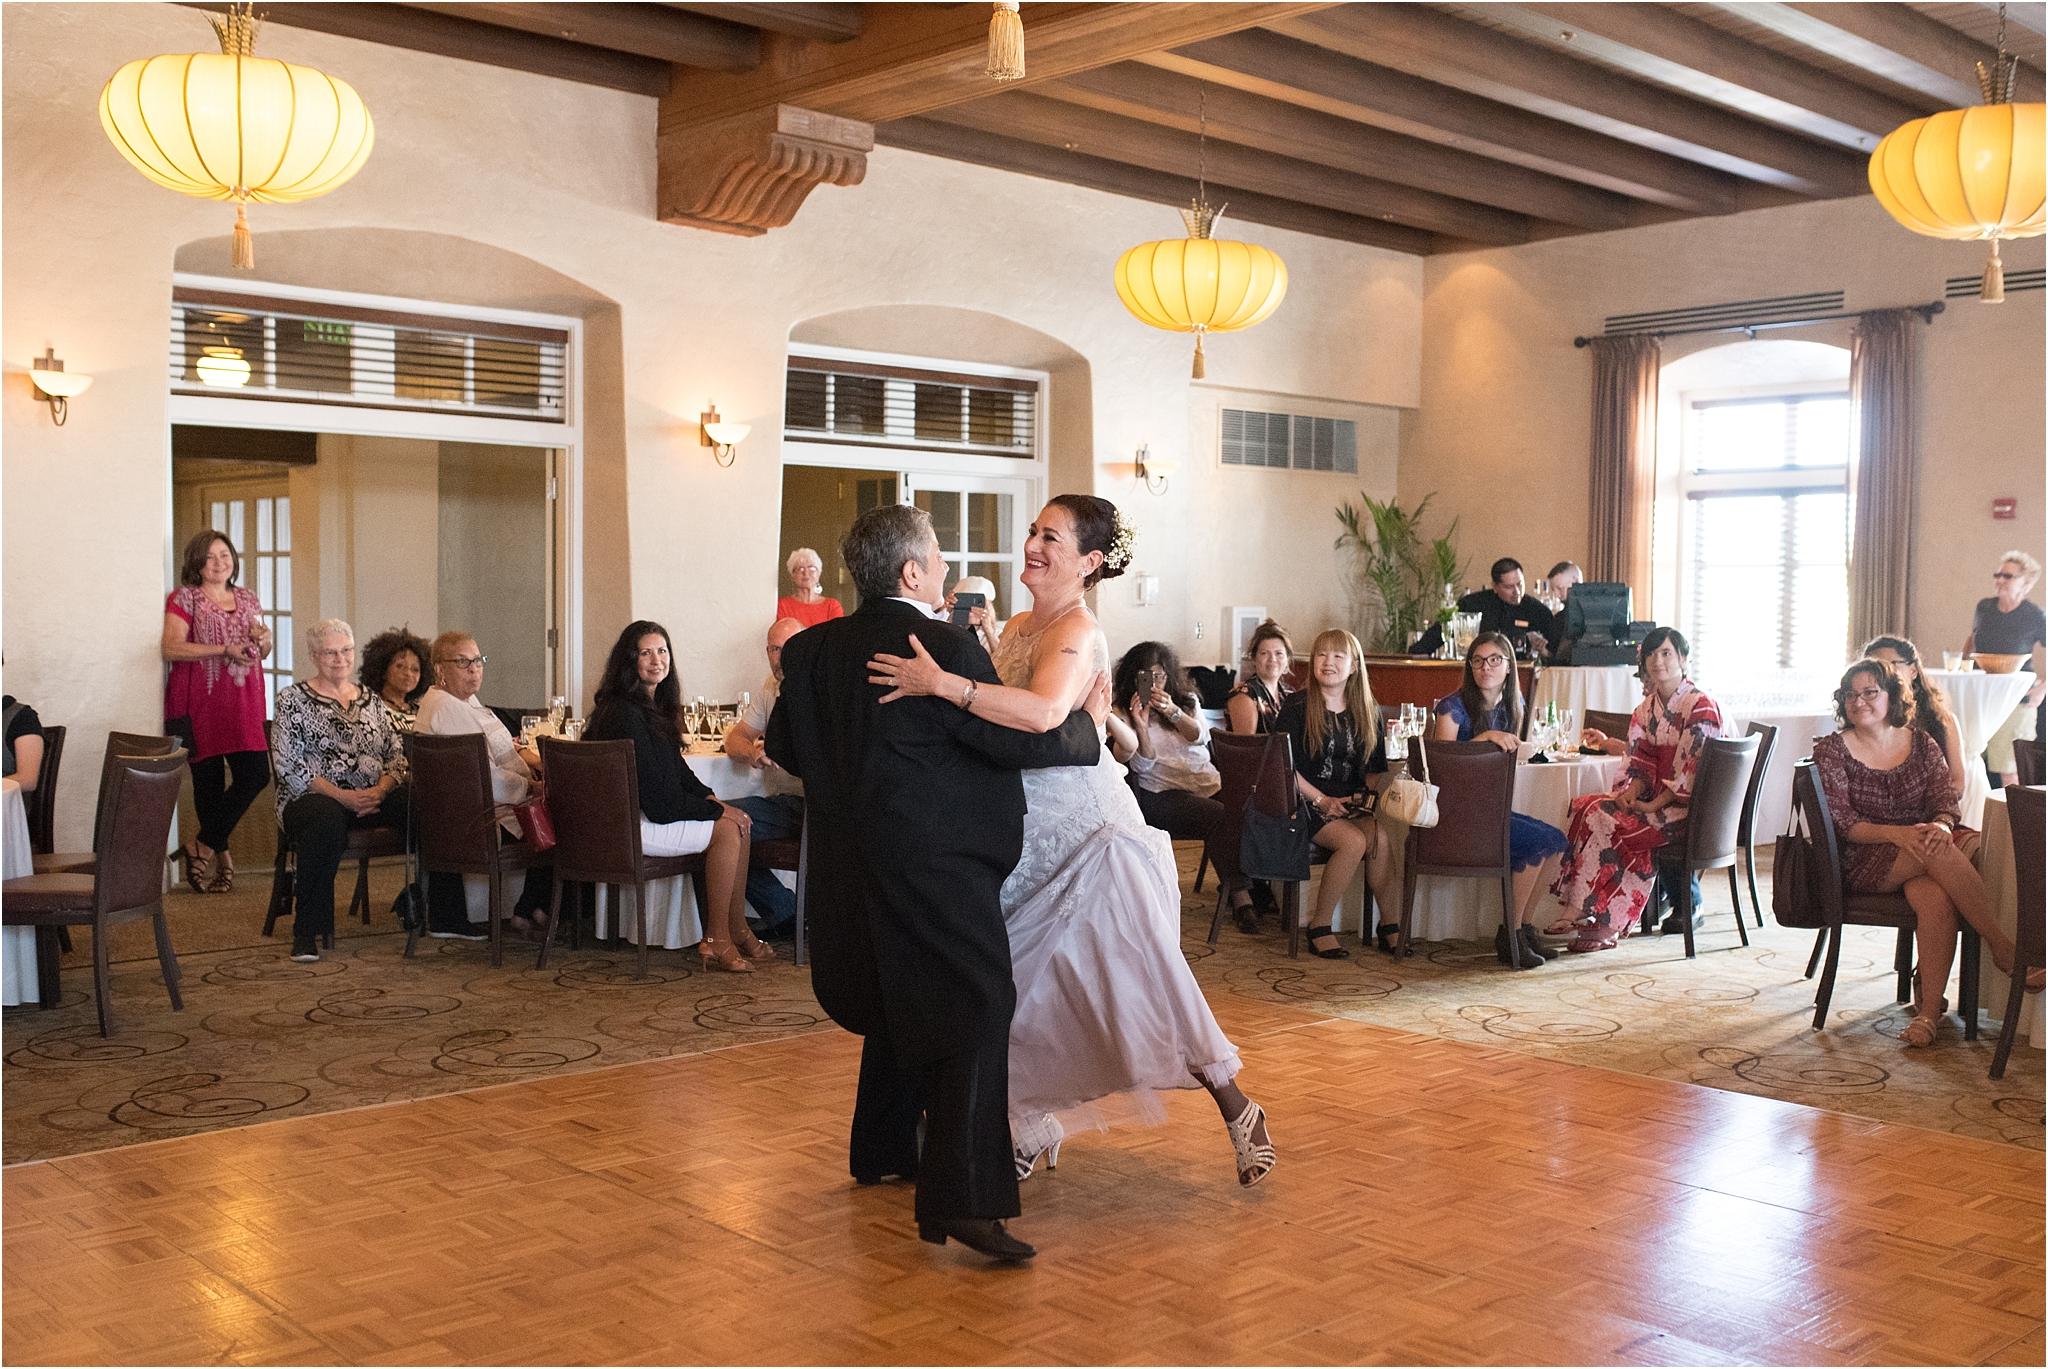 kayla kitts photography - albuquerque wedding photographer - hotel andaluz wedding_0027.jpg